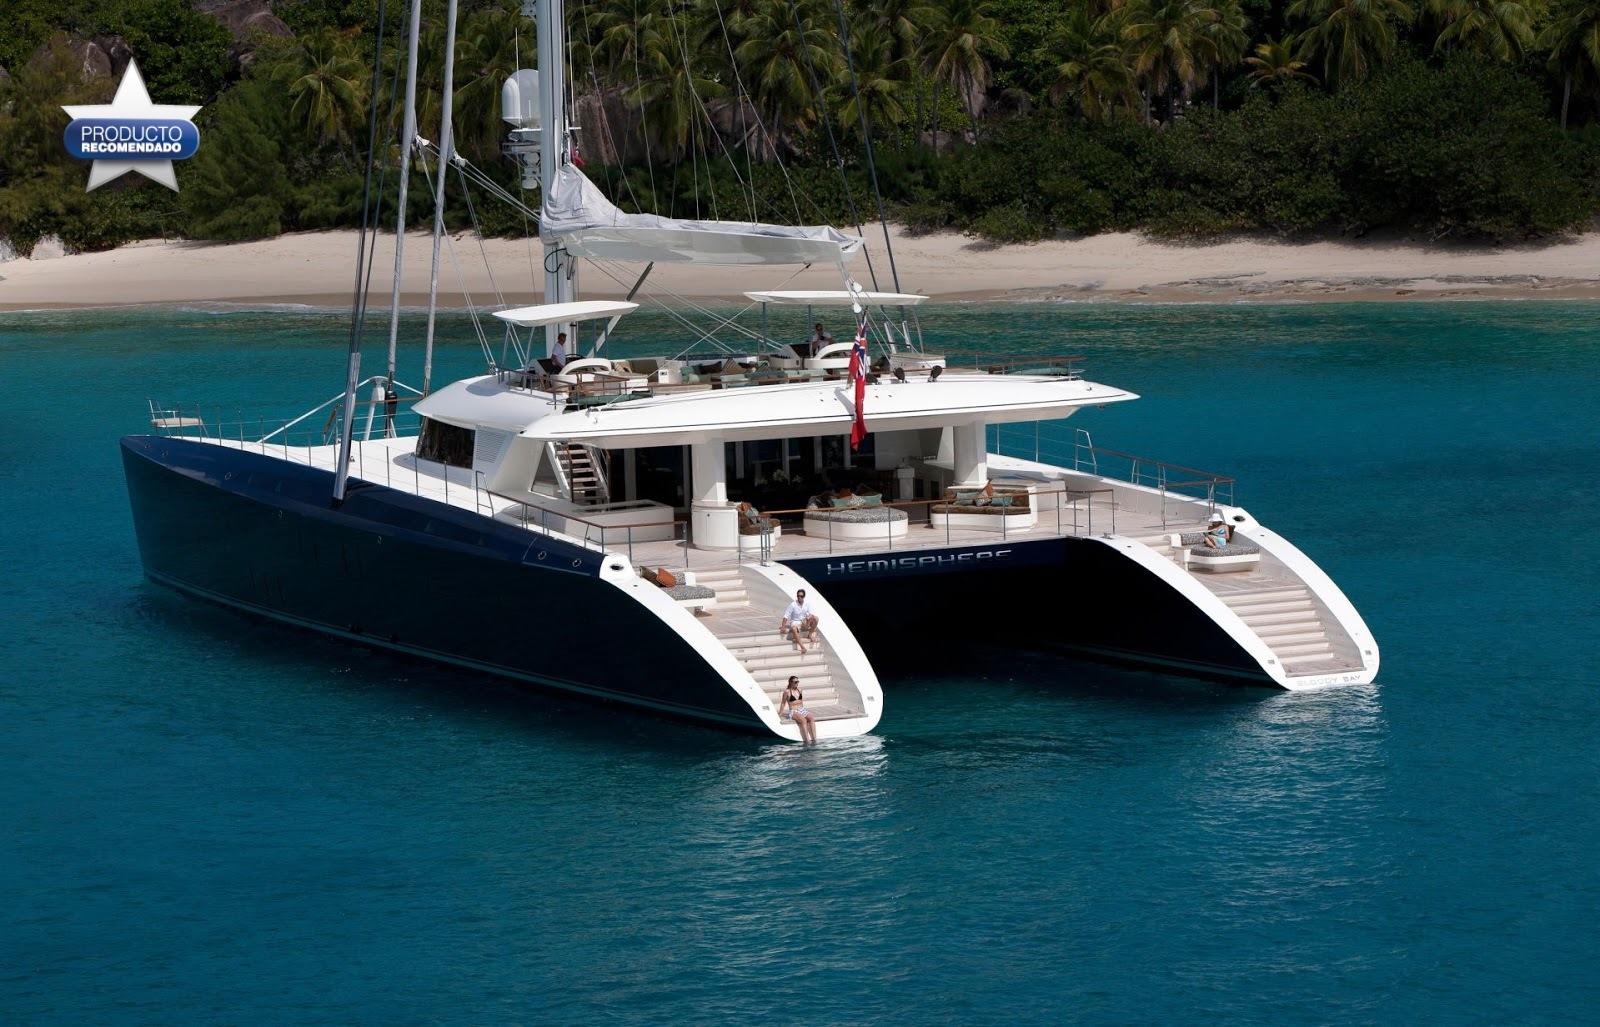 Alquialr catamaranes de lujo